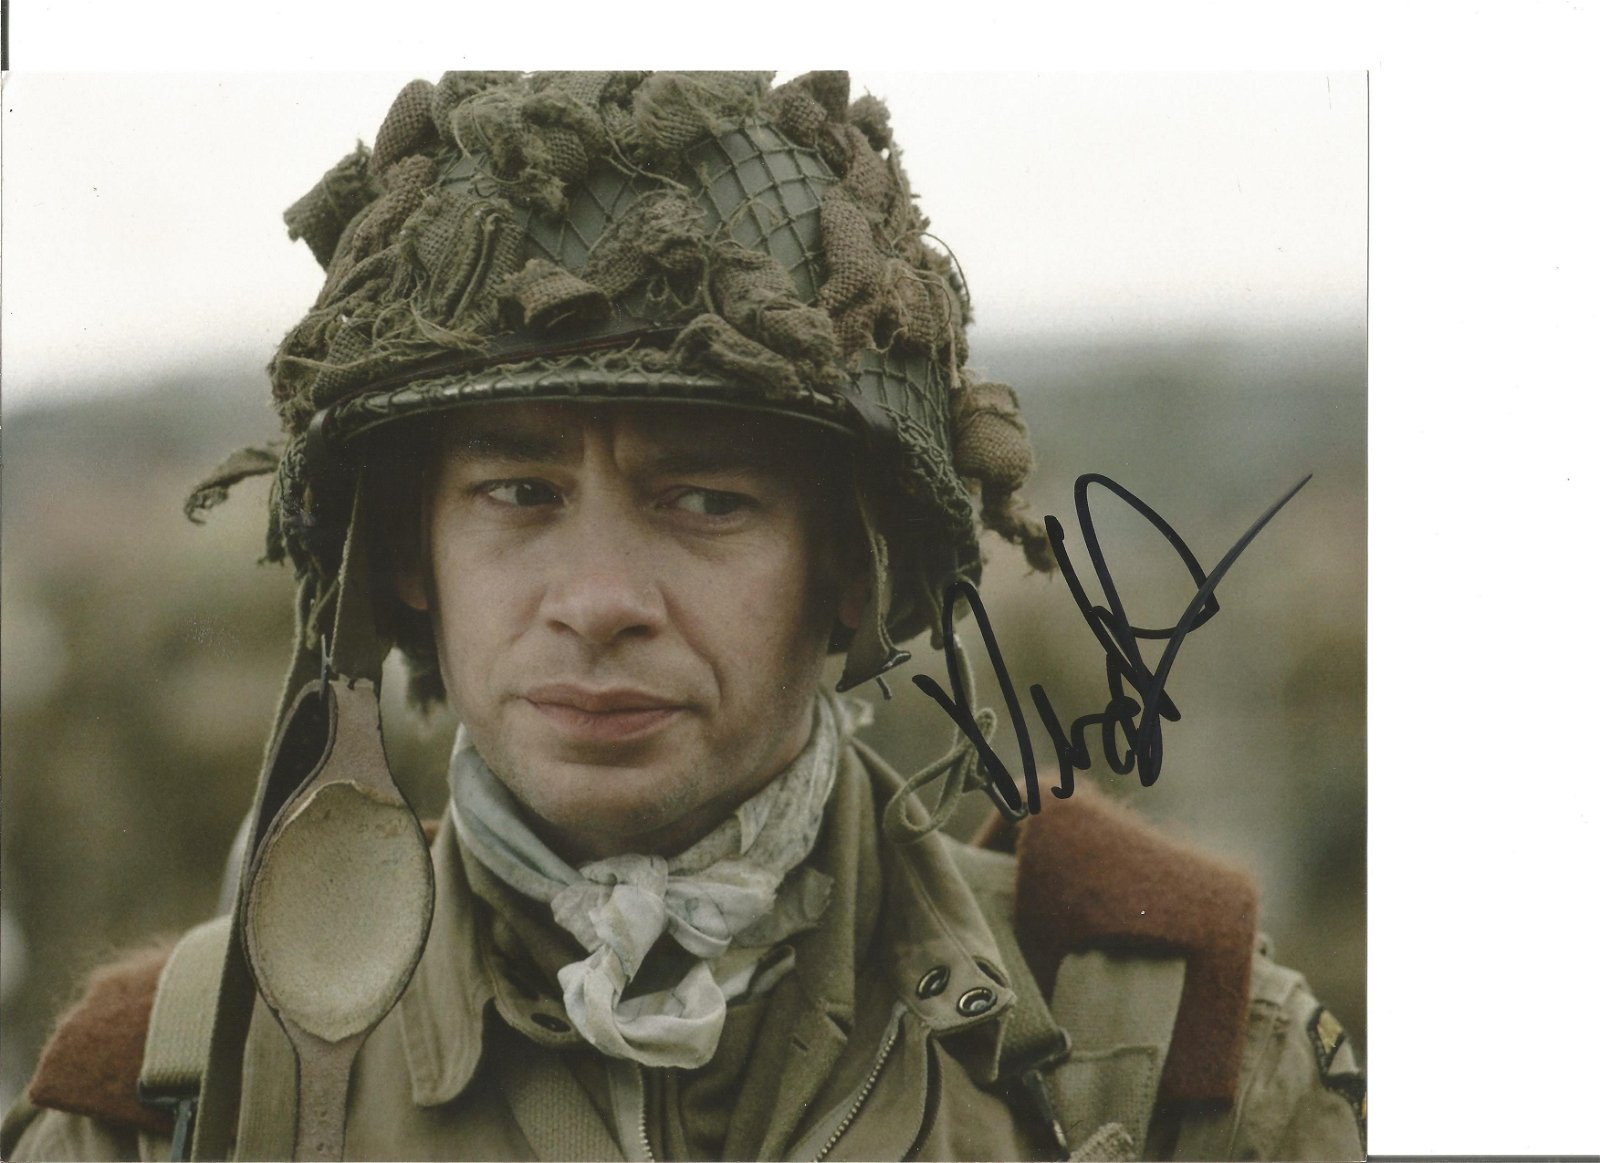 Dexter Fletcher Actor Director Signed 8x10 Photo. Good